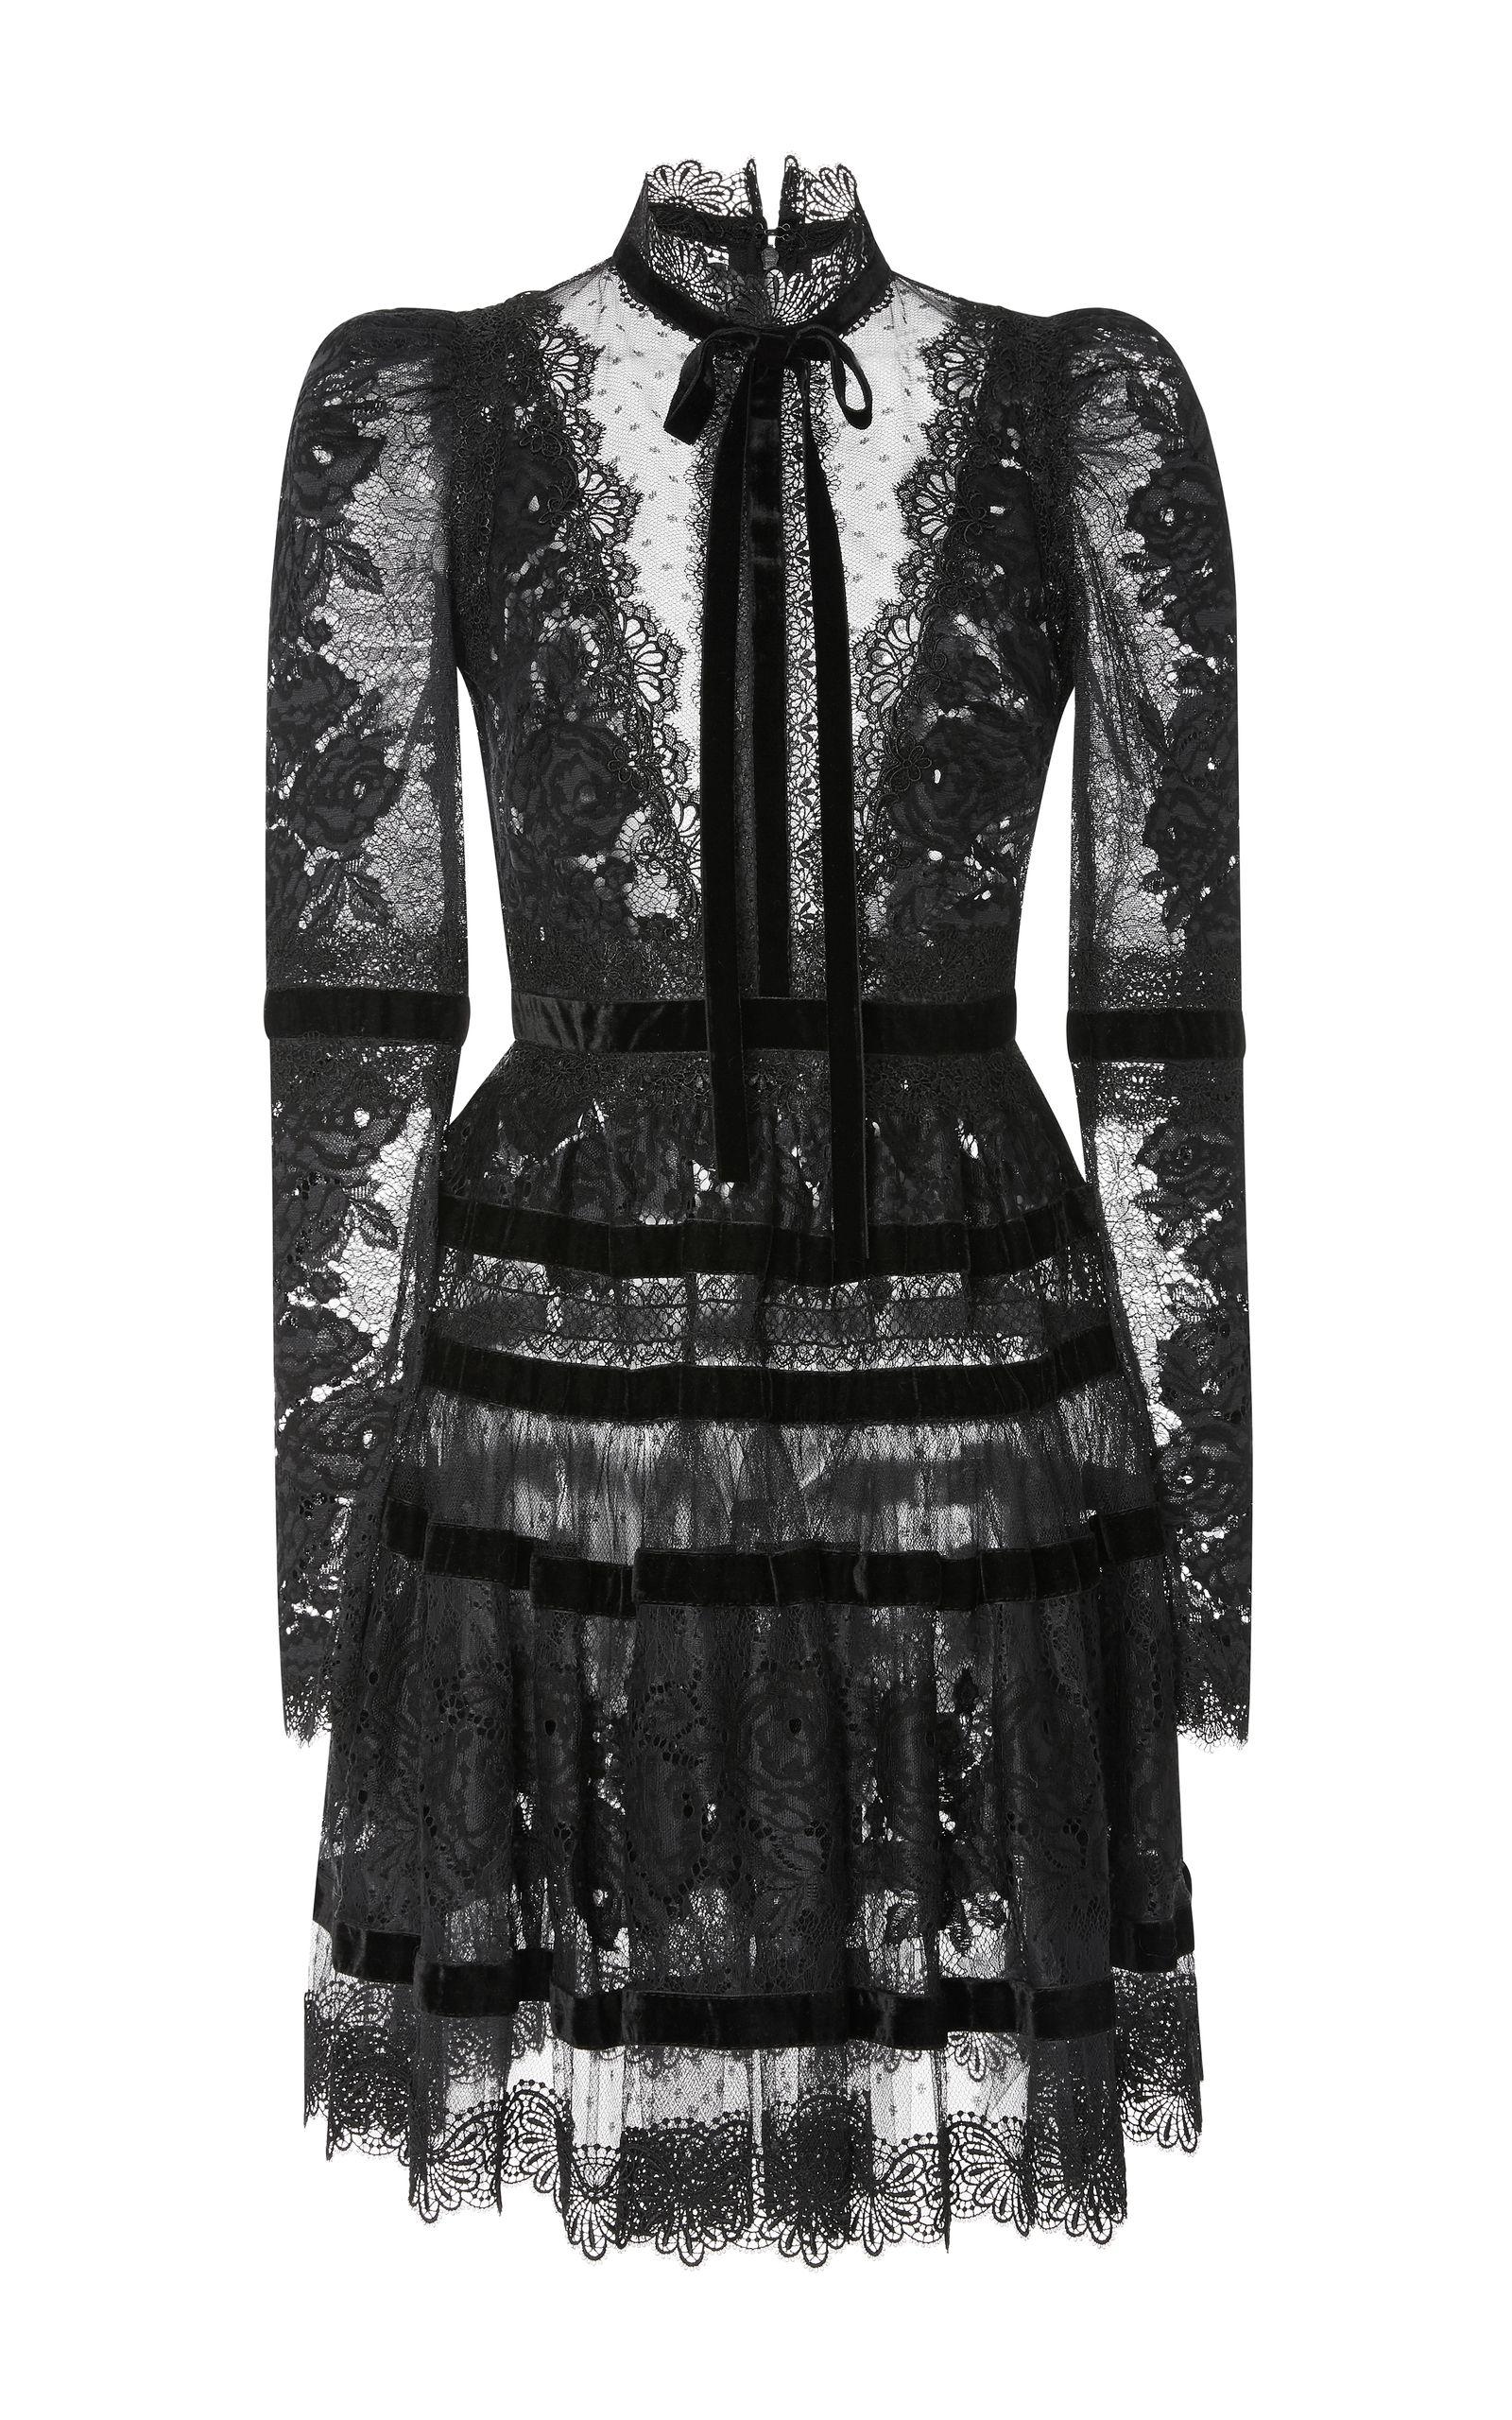 Elie saab eliesaab cloth dress haute couture dress